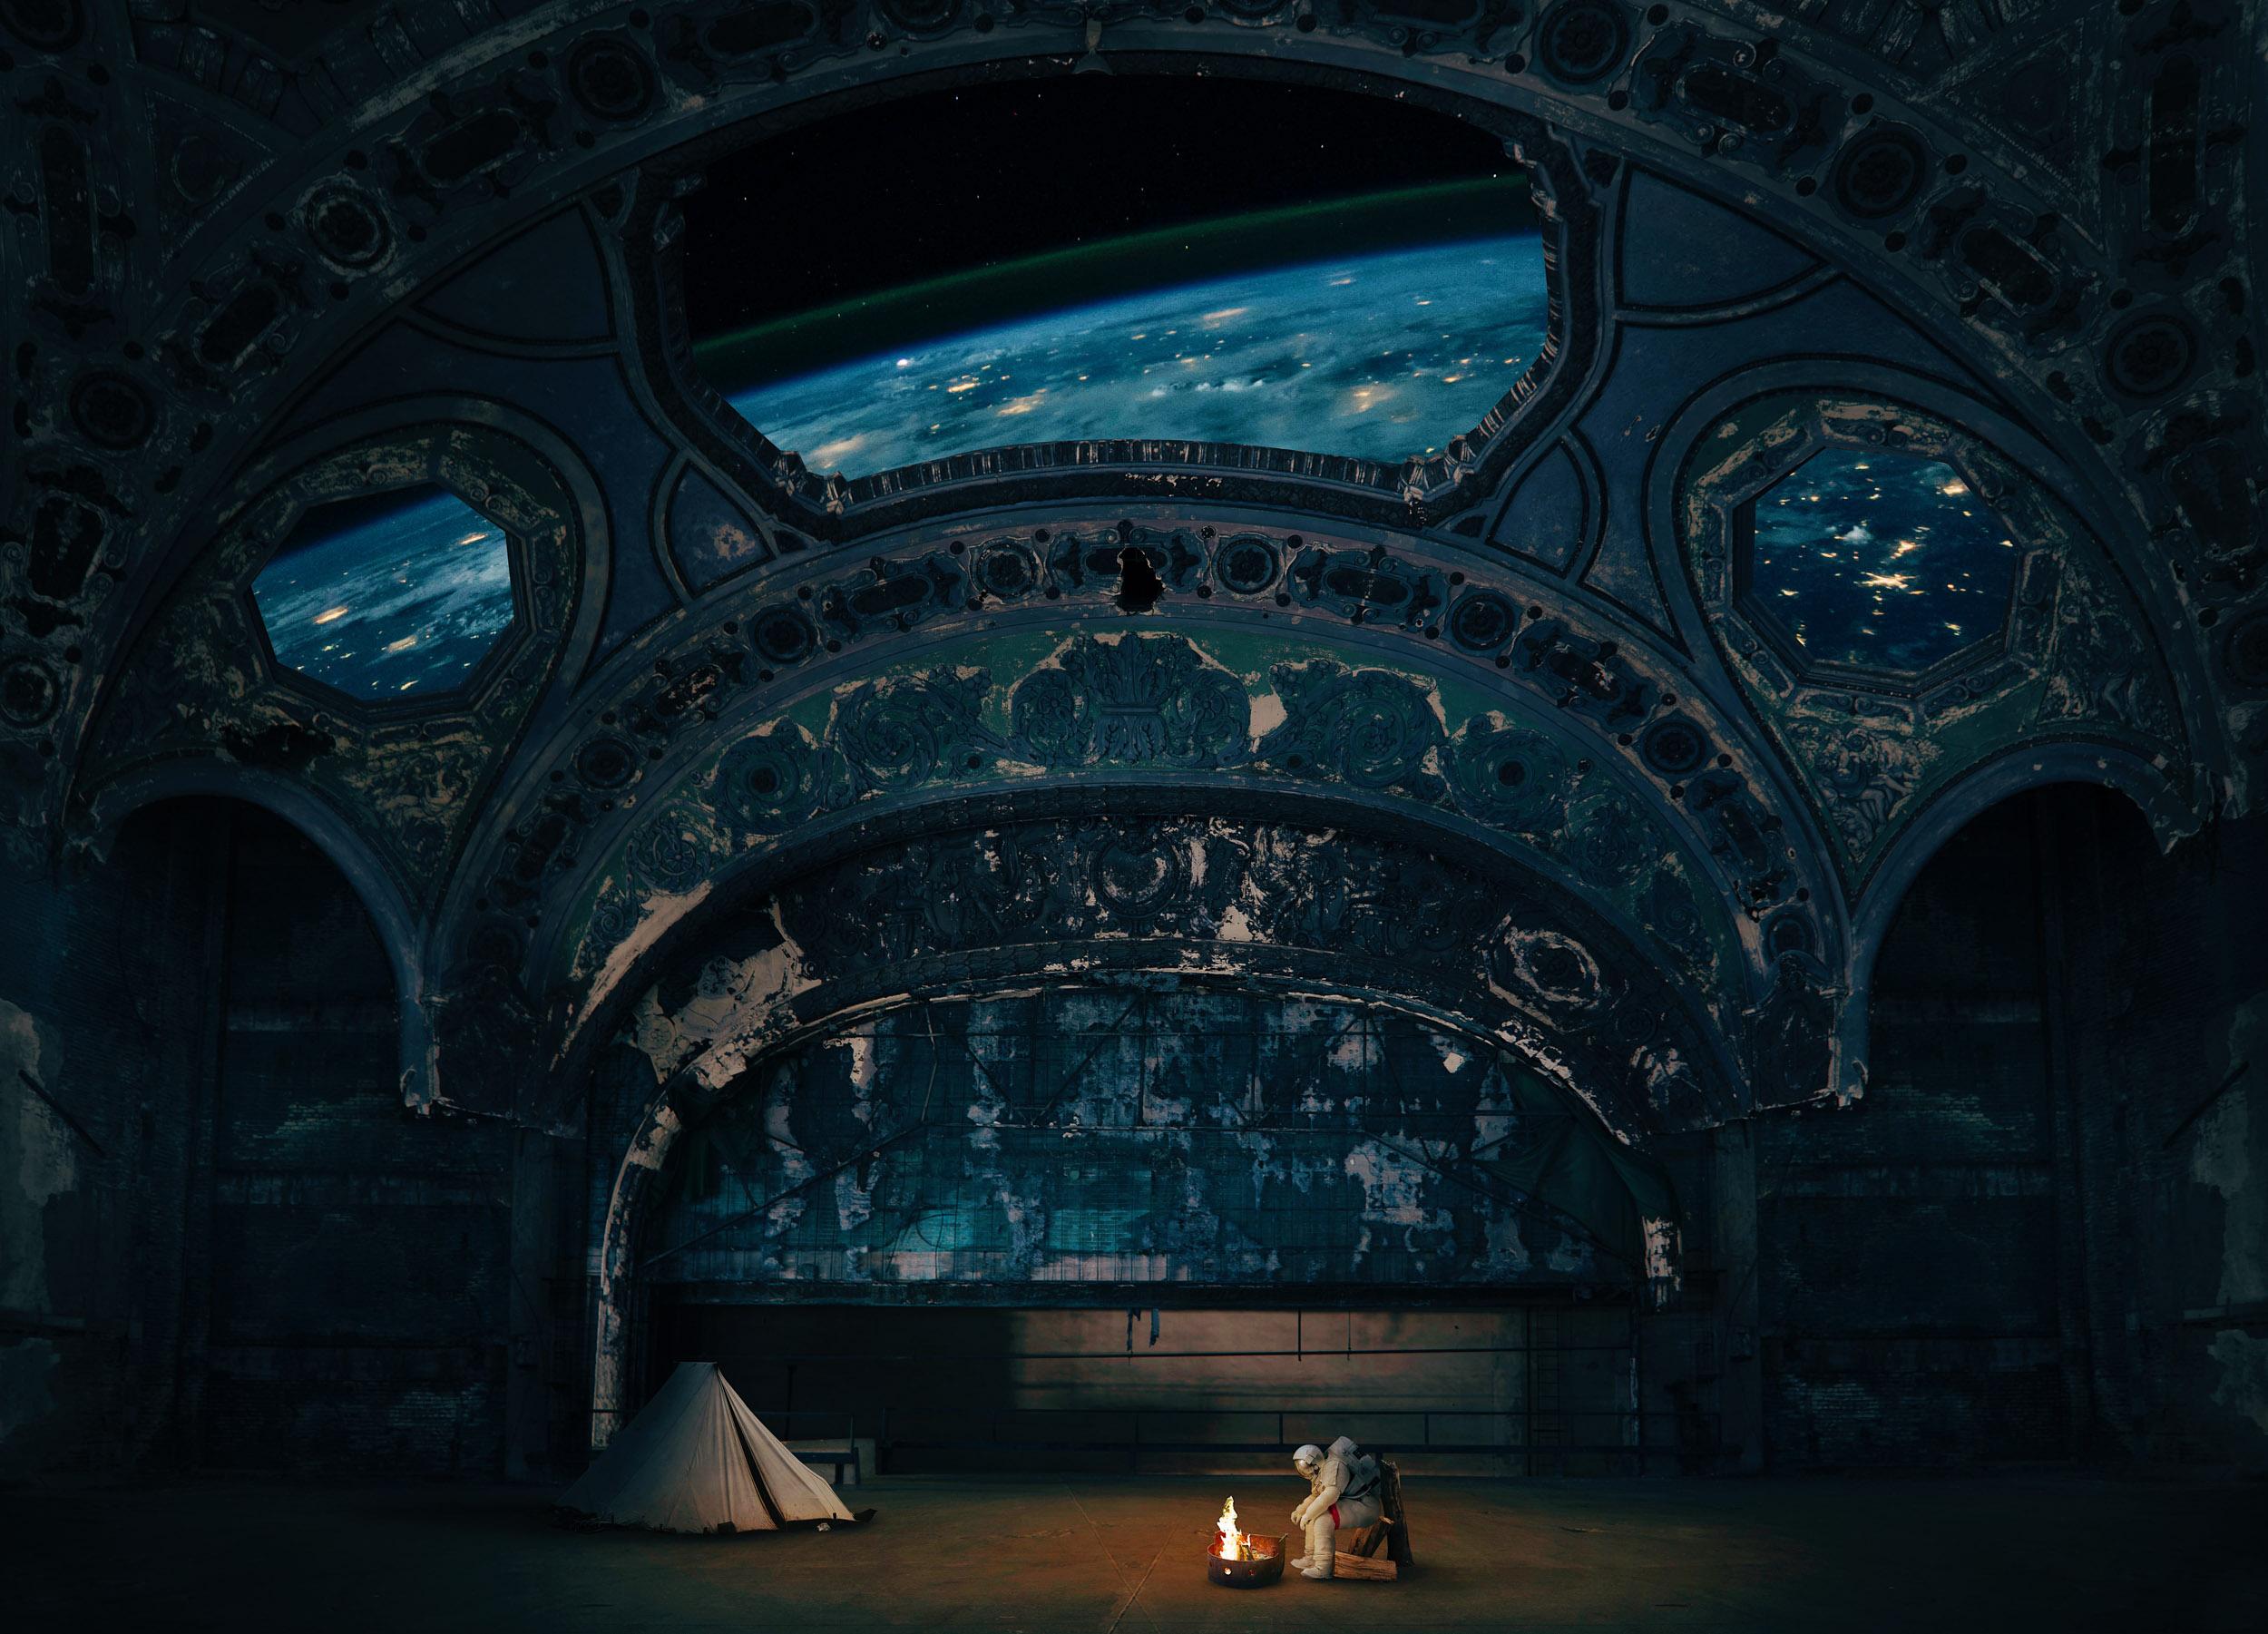 cosmonat-4.jpg